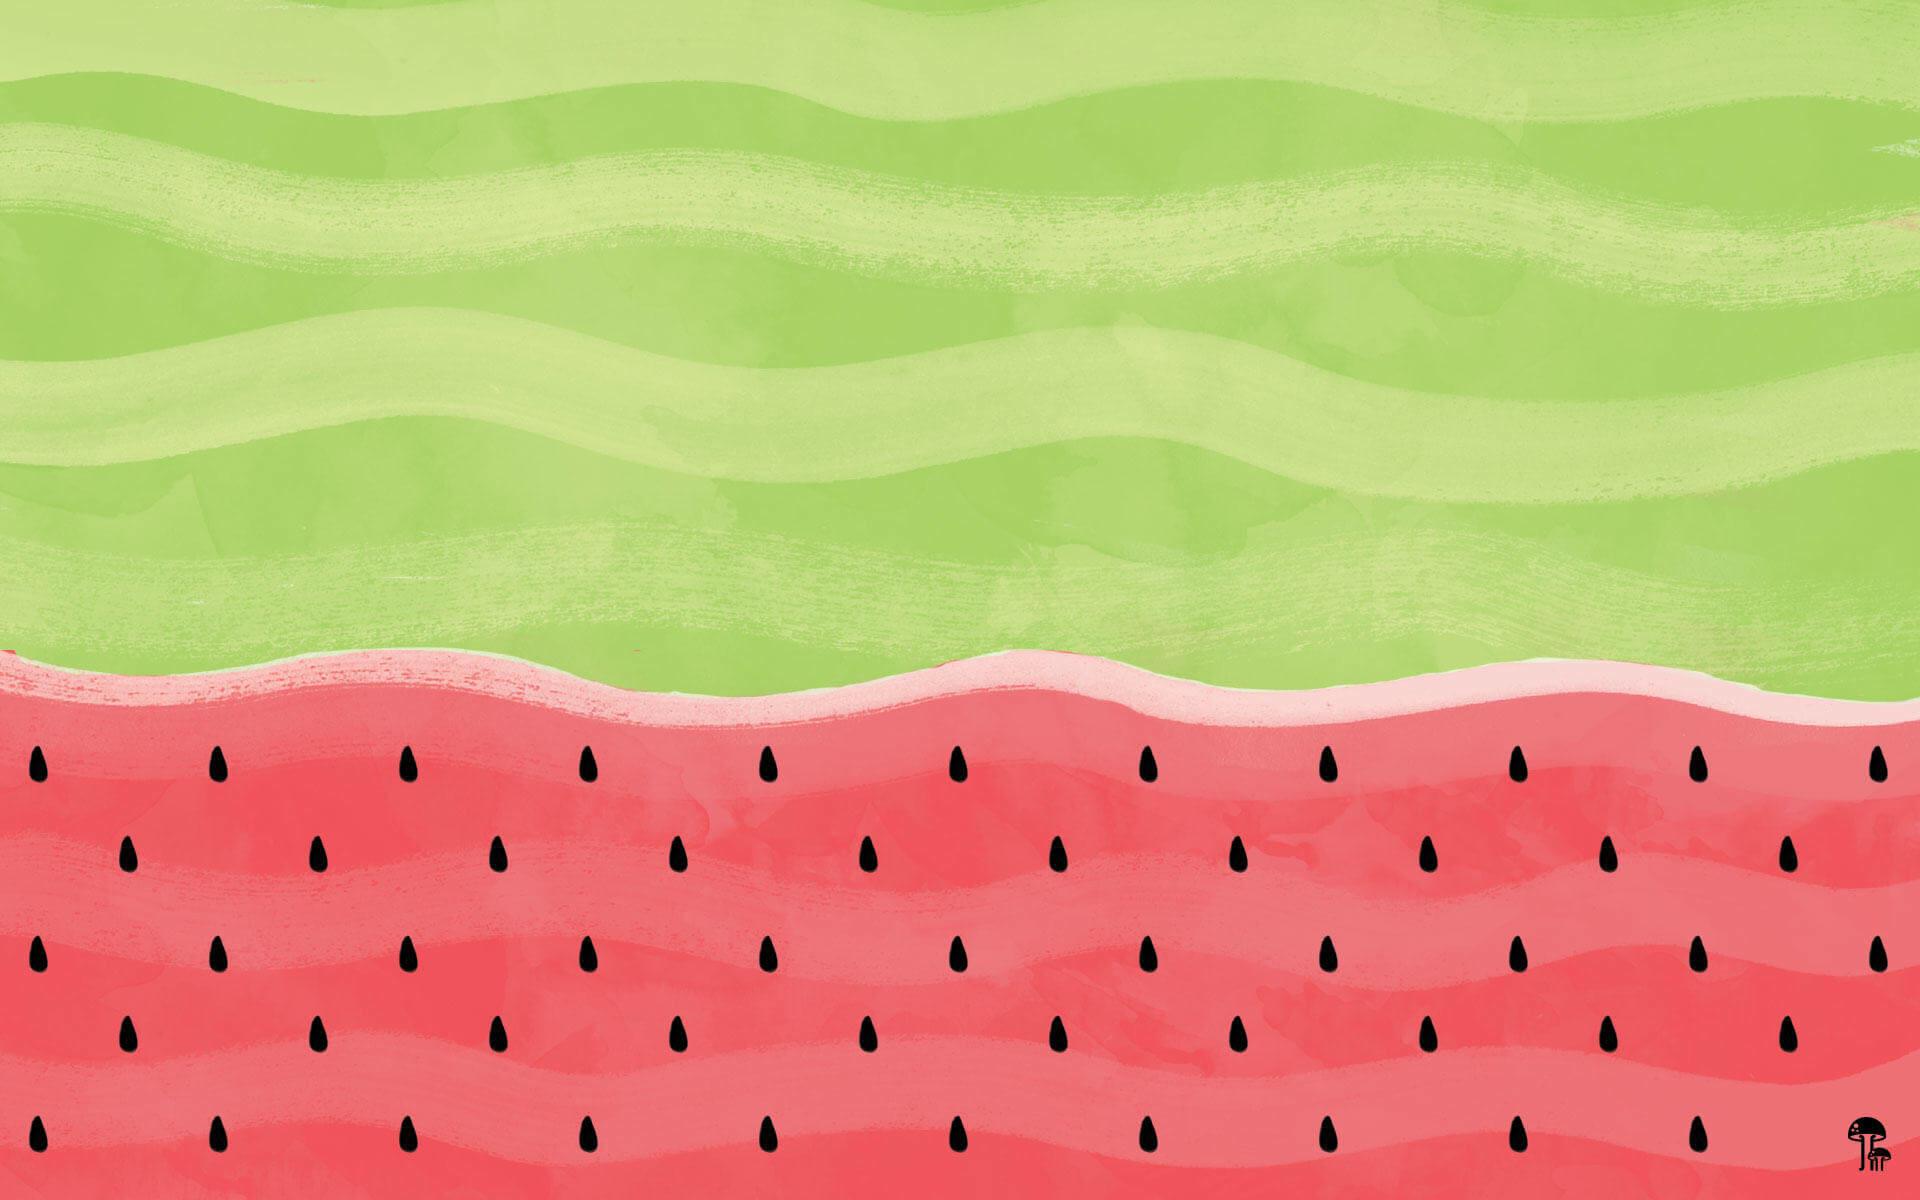 Animal Crossing Desktop Wallpaper (80+ Images